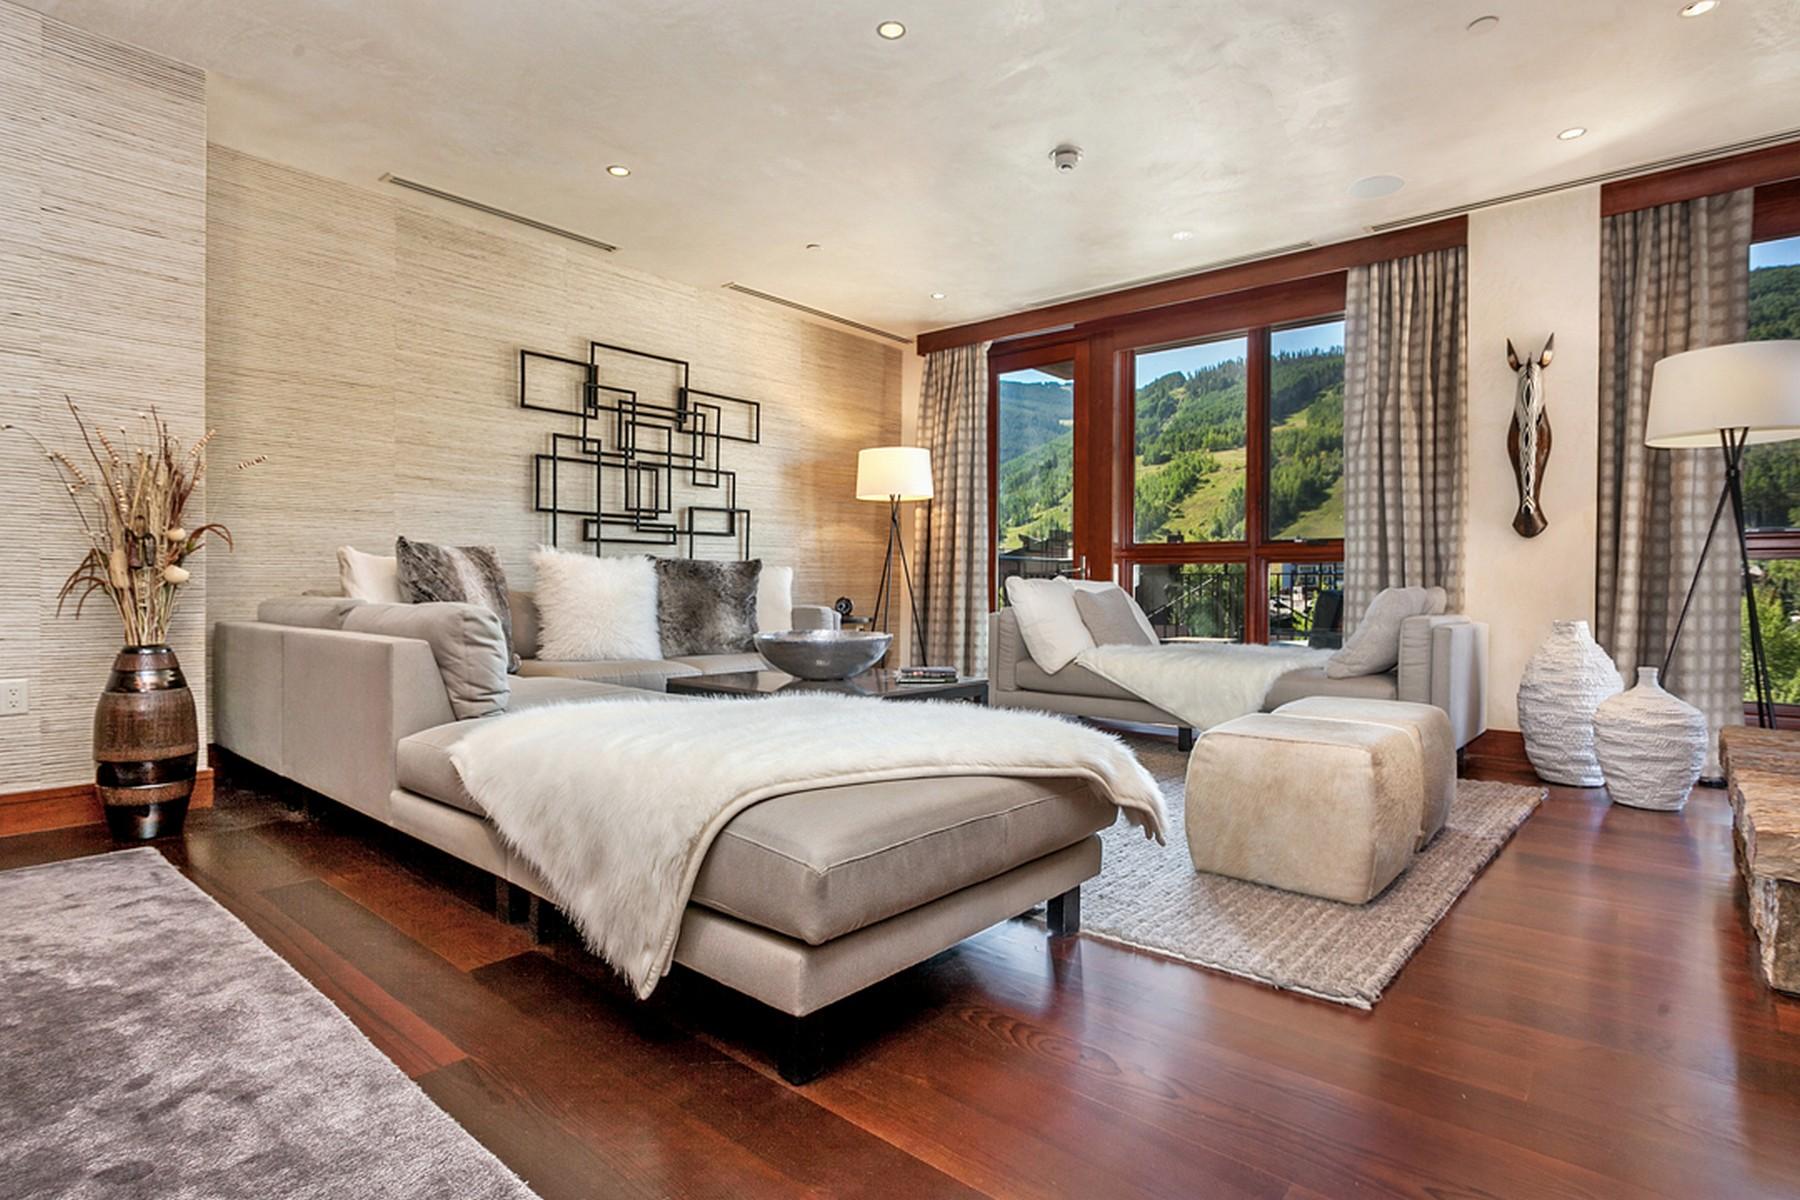 Apartments للـ Sale في Solaris 5B East 141 East Meadow Drive #5B E, Vail, Colorado 81657 United States